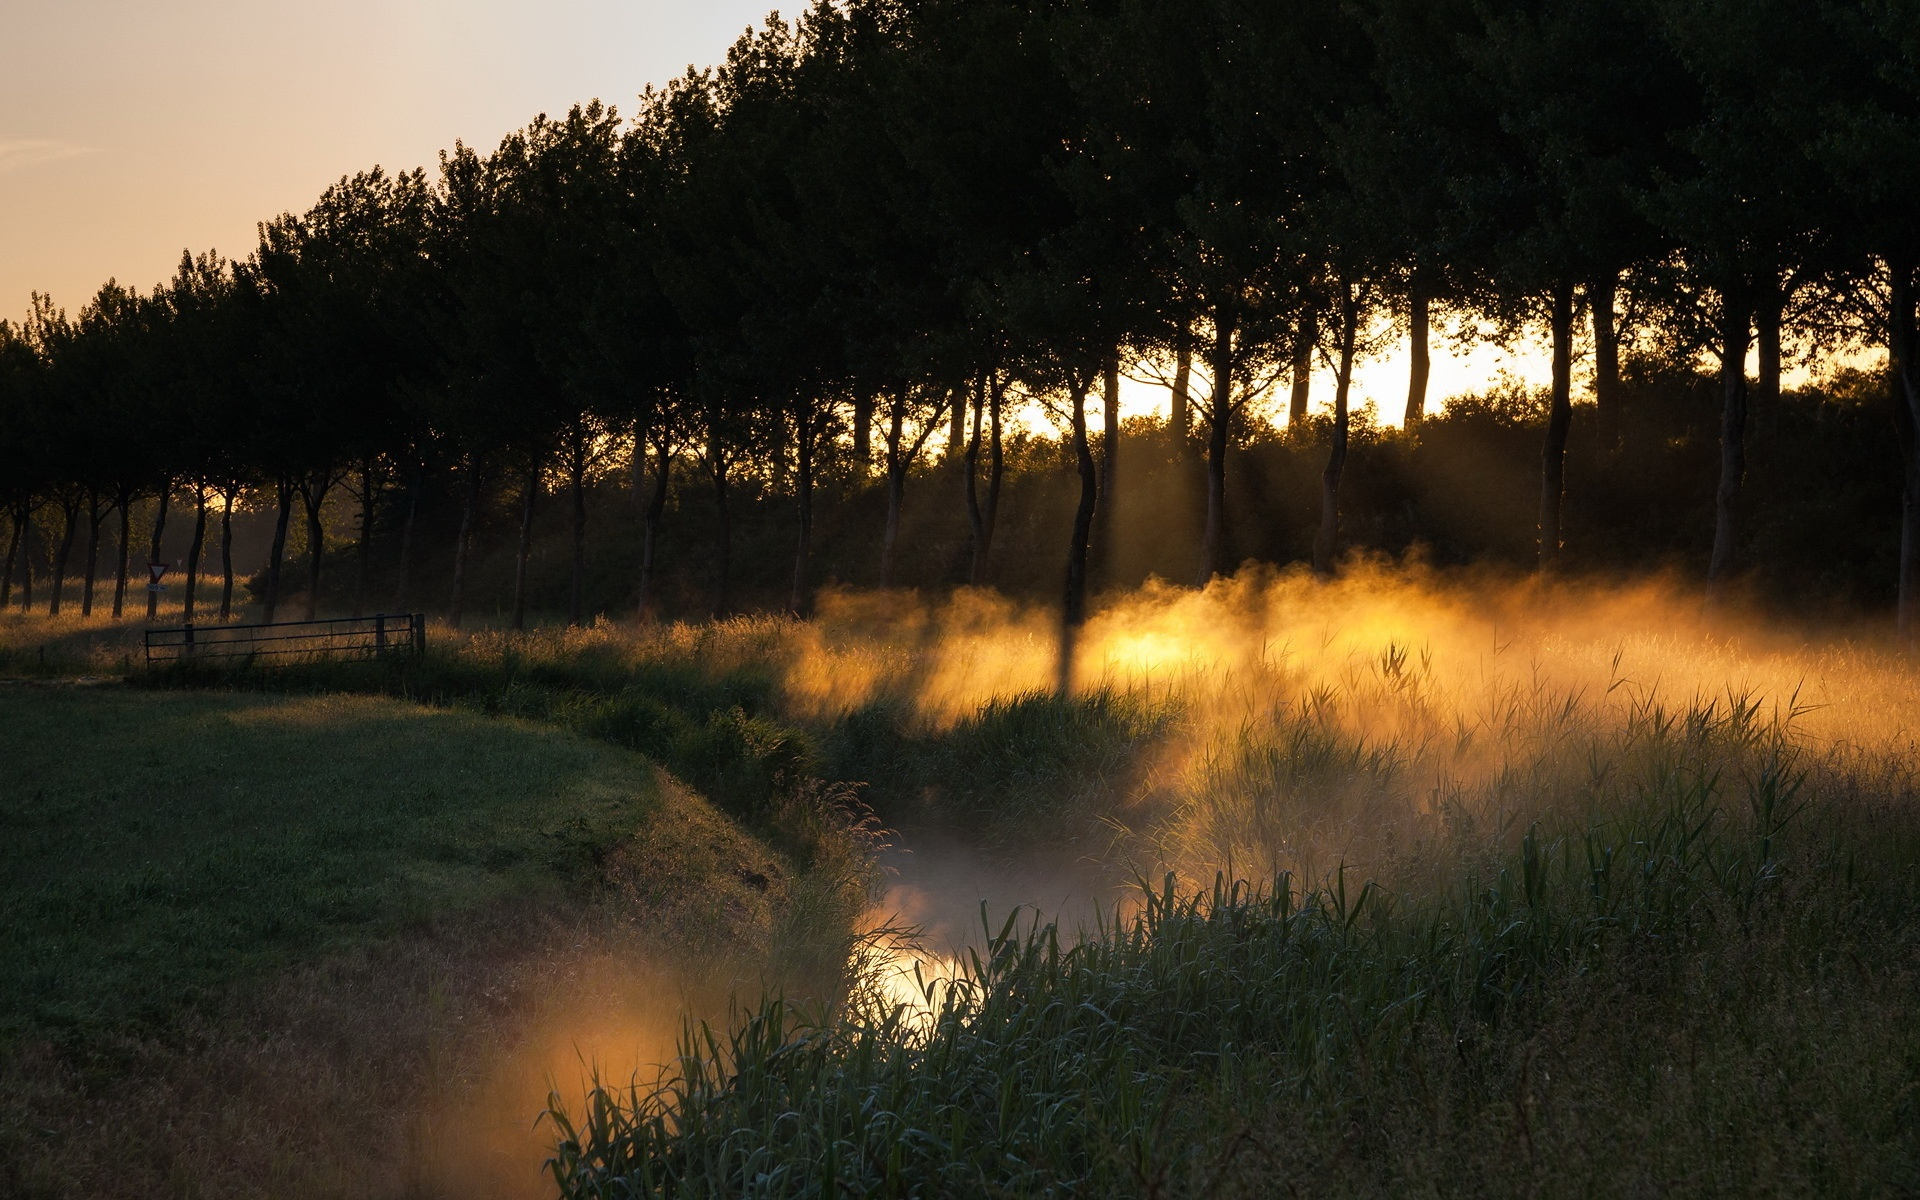 Закат в тумане в лесу бесплатно